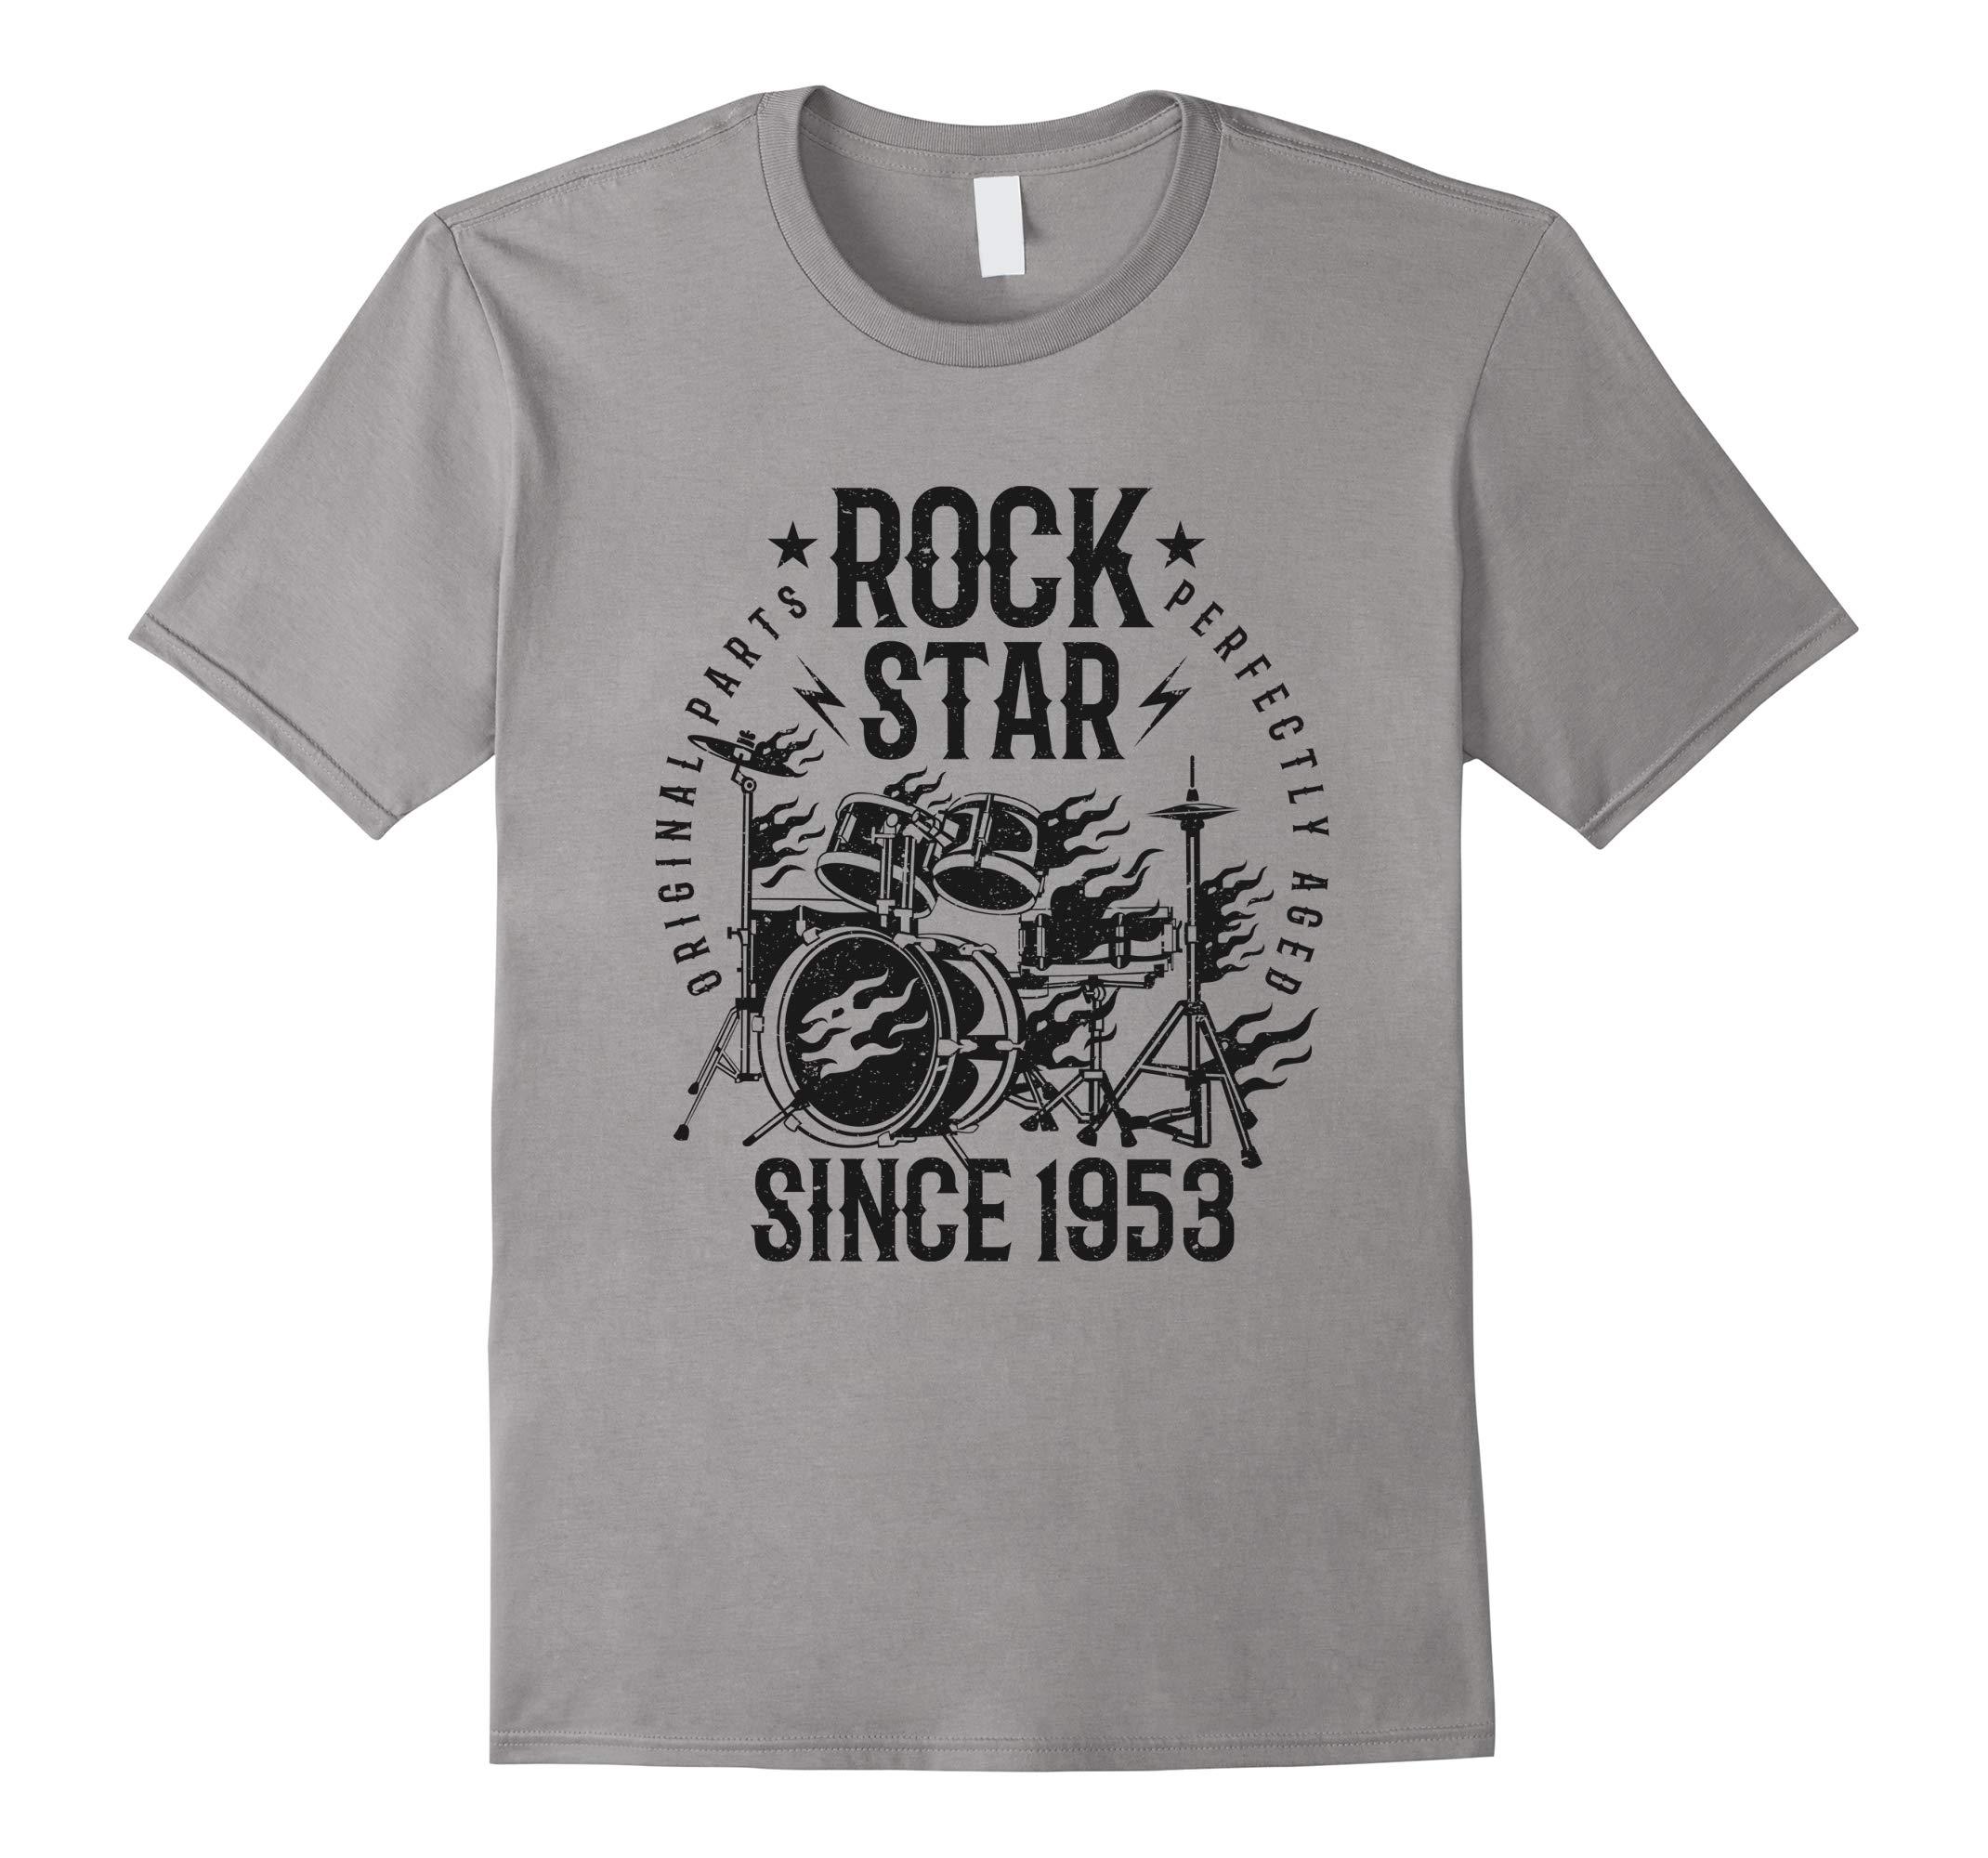 65th Birthday Gift T-Shirt Rock Star Since 1953 Grey-RT